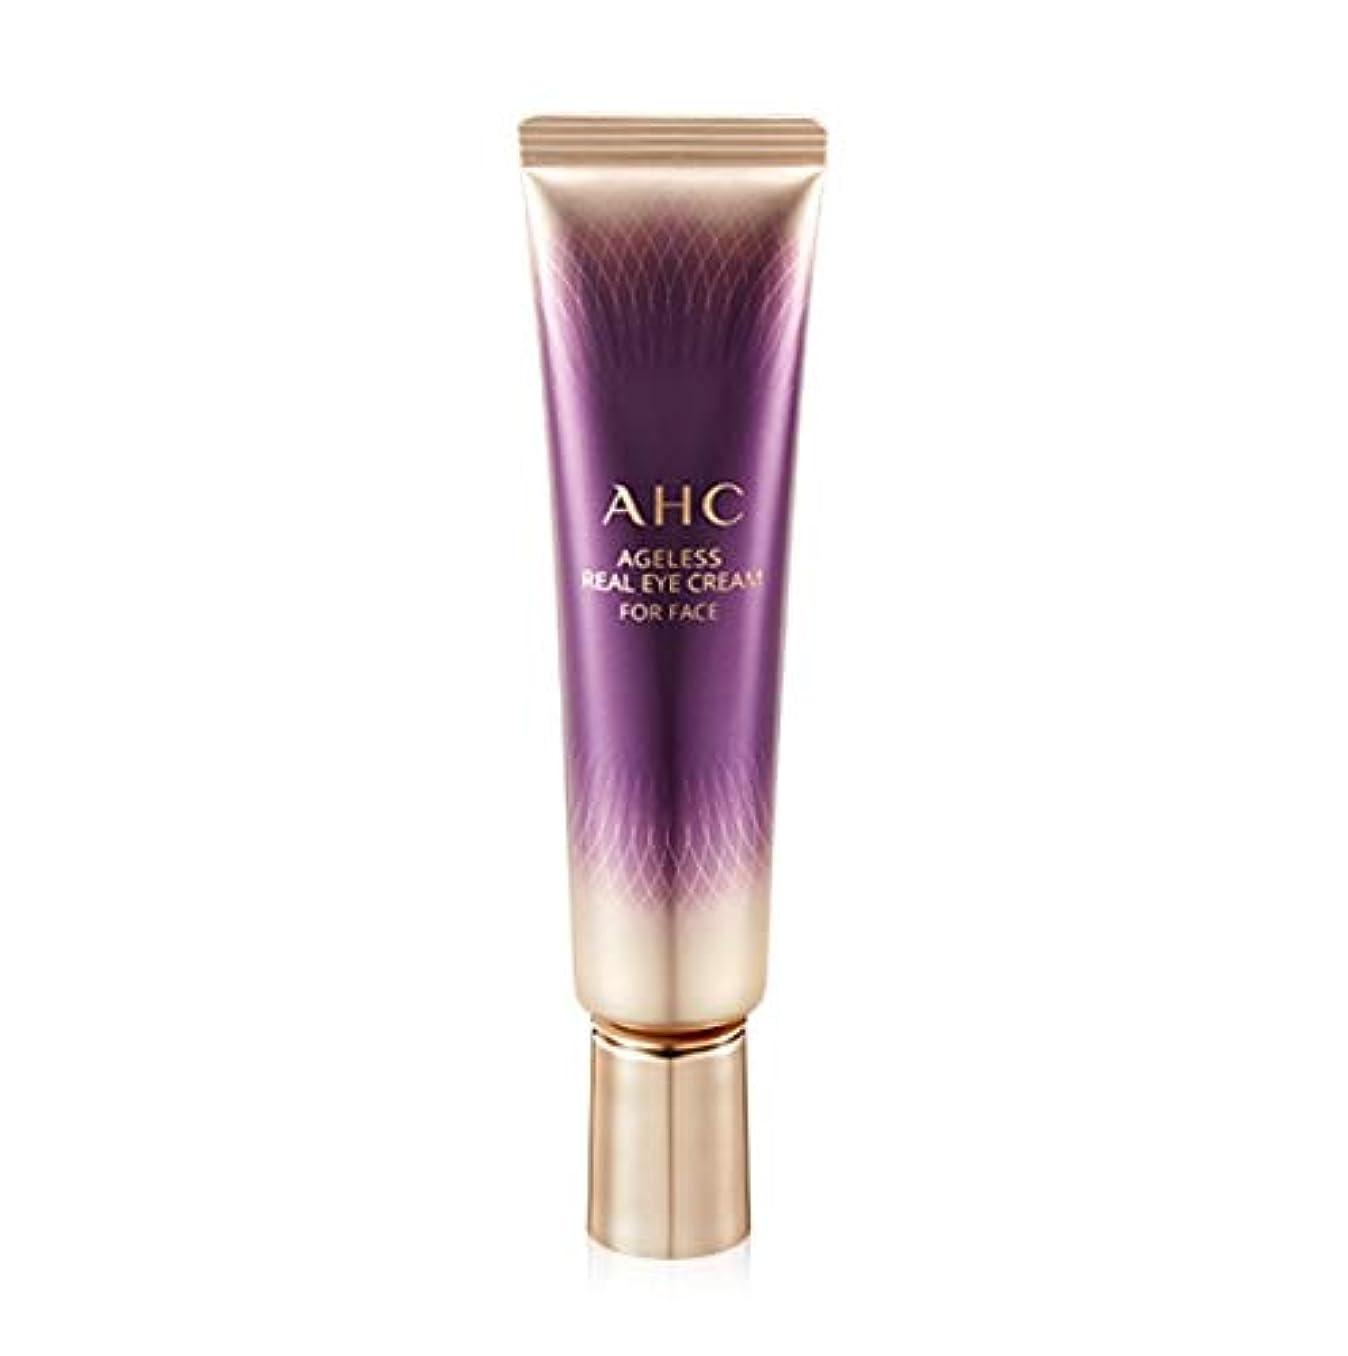 [New] AHC Ageless Real Eye Cream For Face Season 7 30ml / AHC エイジレス リアル アイクリーム フォーフェイス 30ml [並行輸入品]